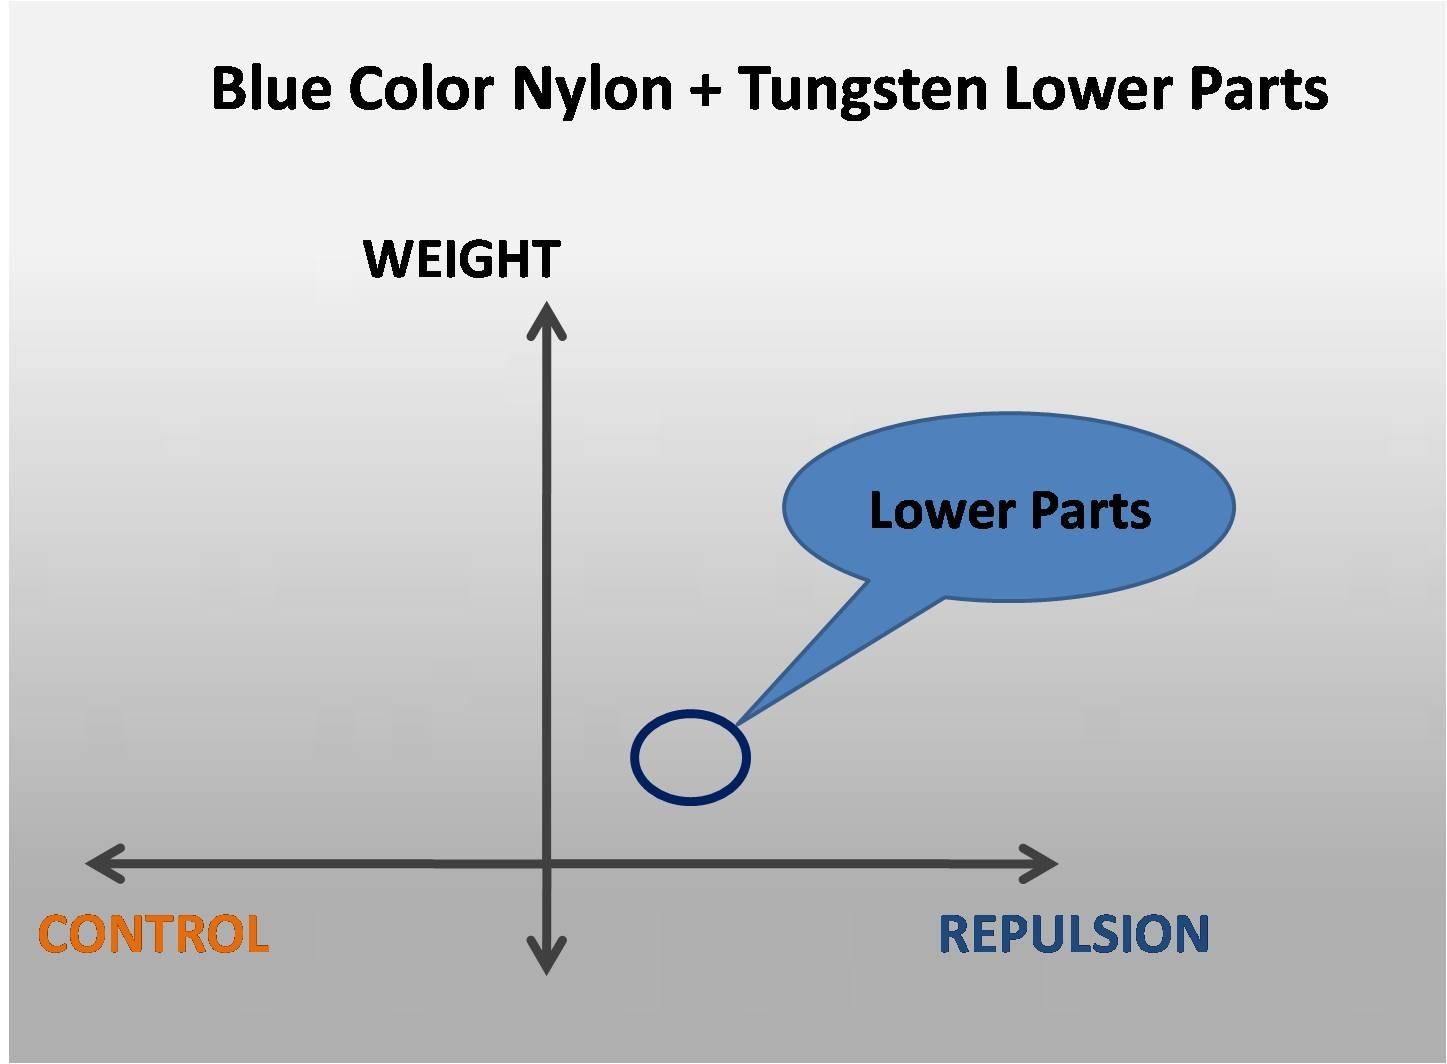 Blue Color Nylon + Tungsten Lower Parts